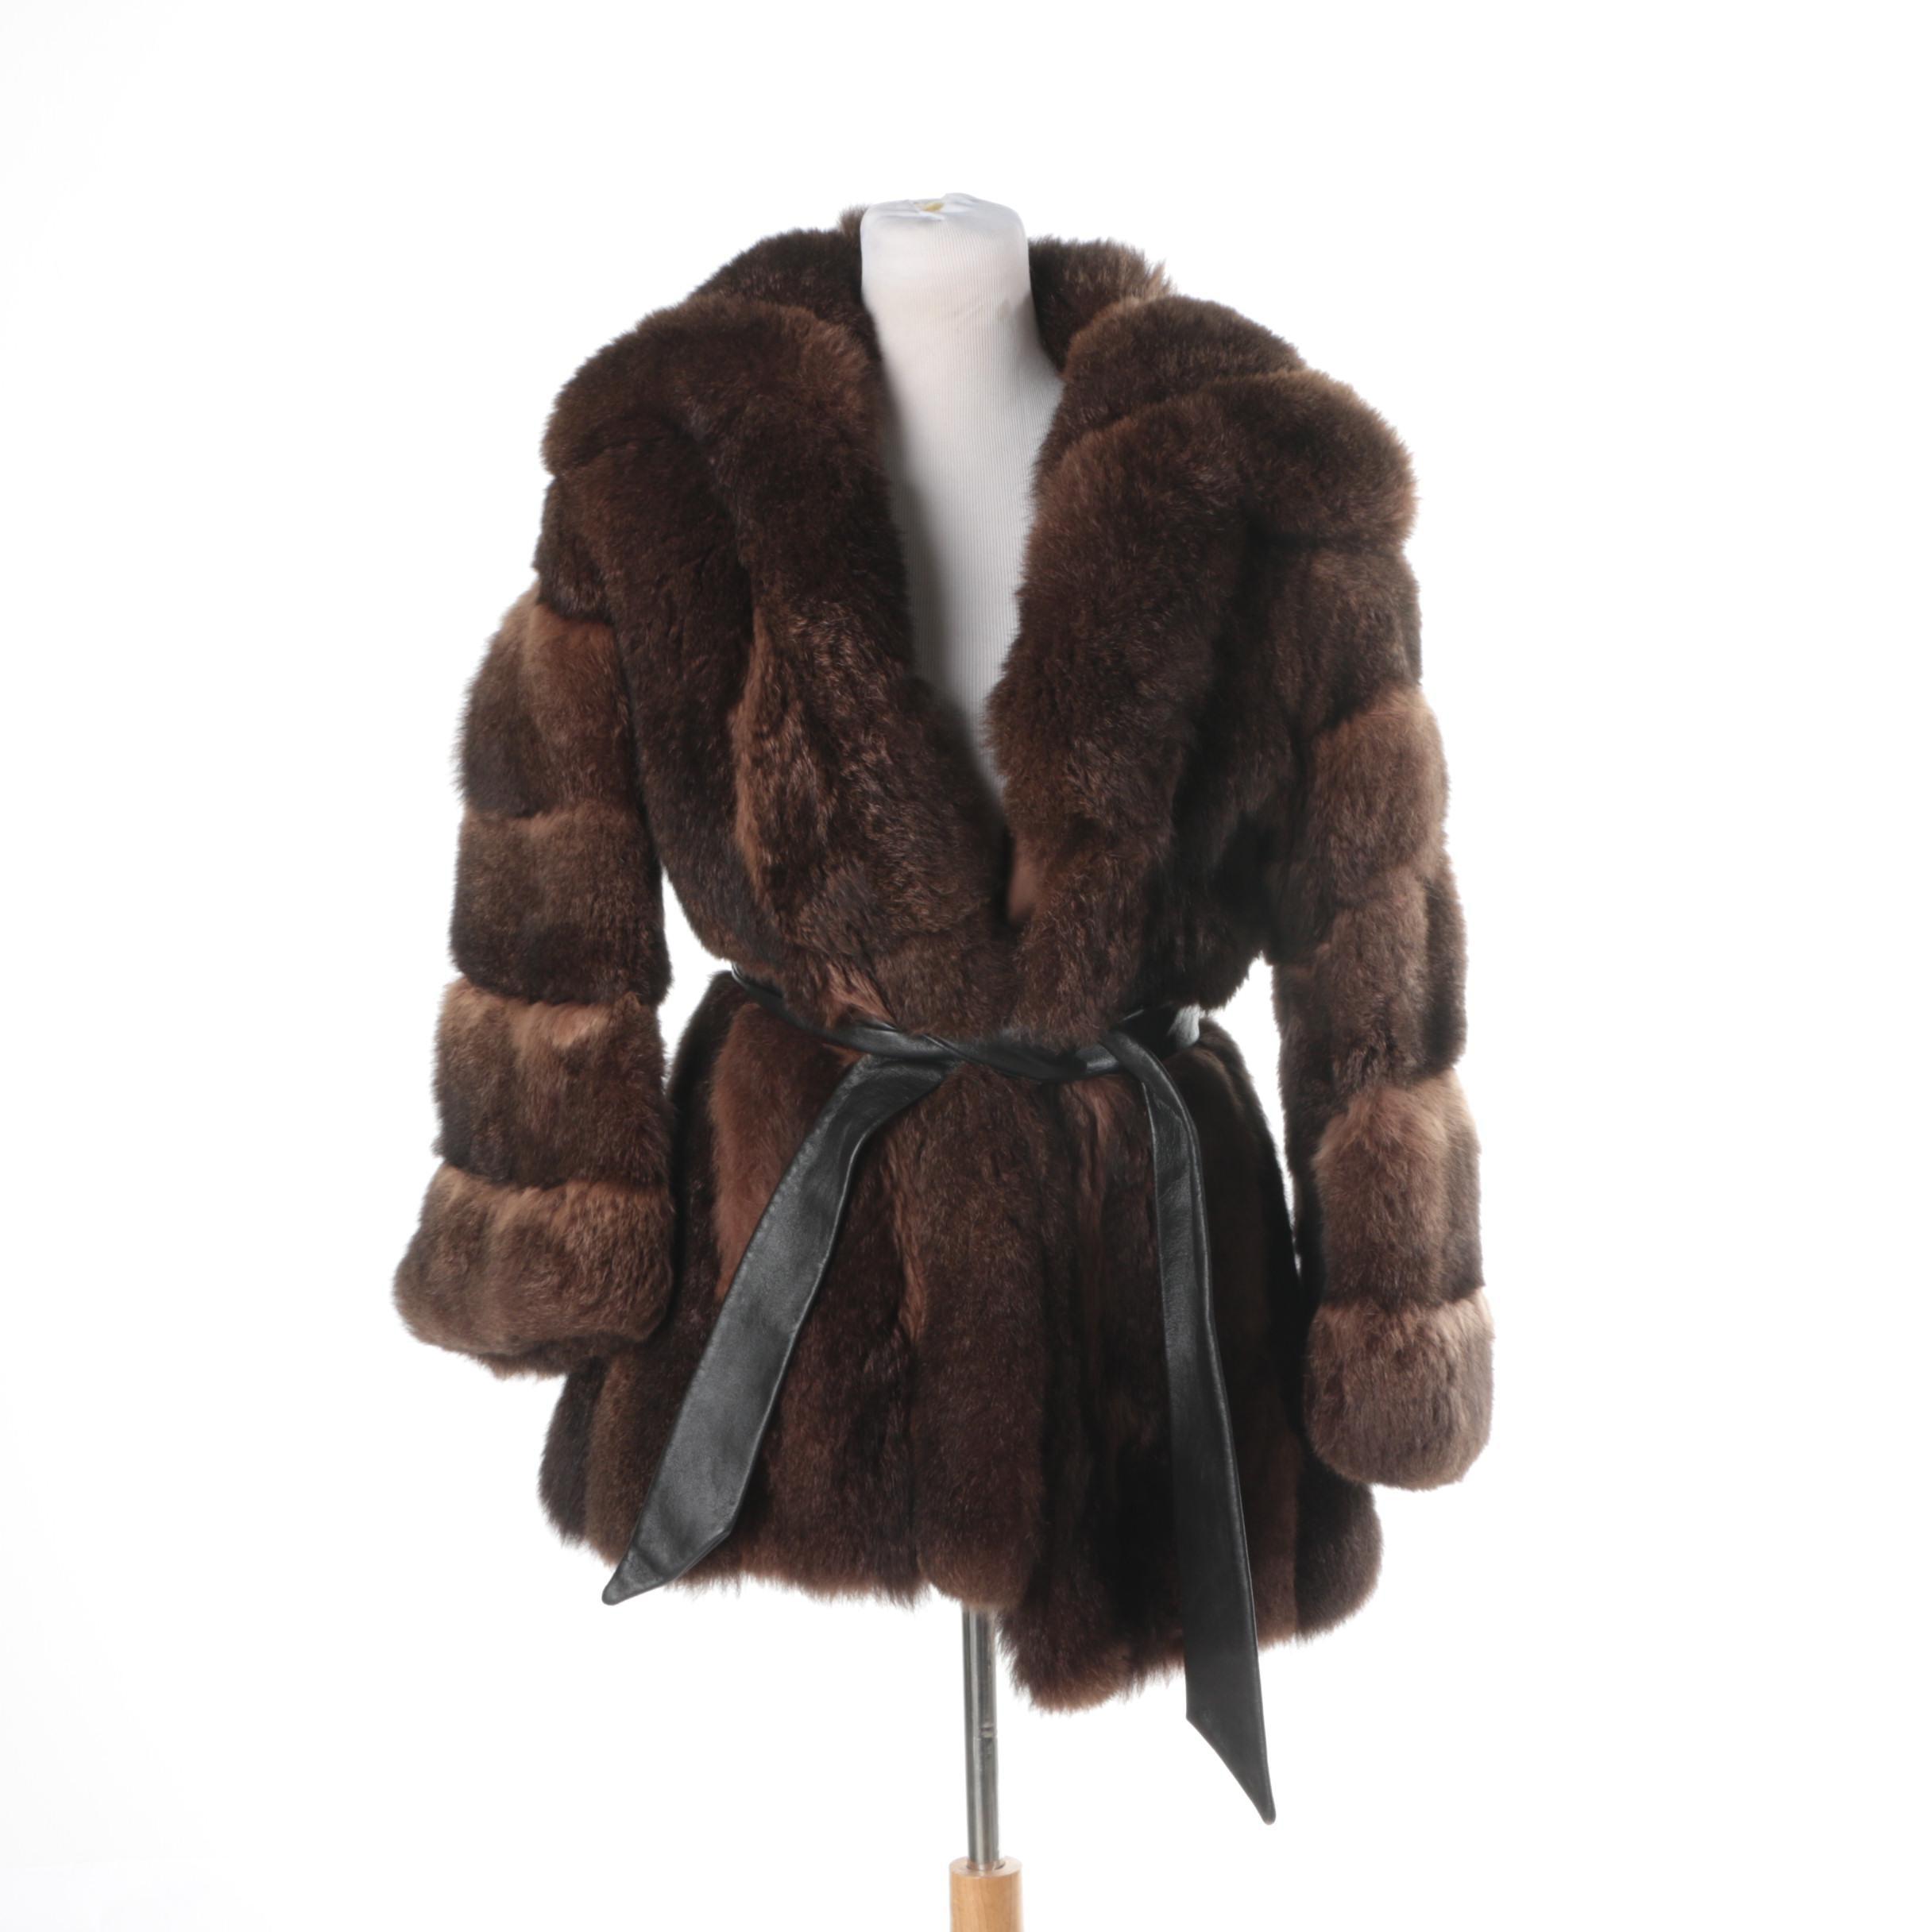 Vintage Australian Possum Fur Coat